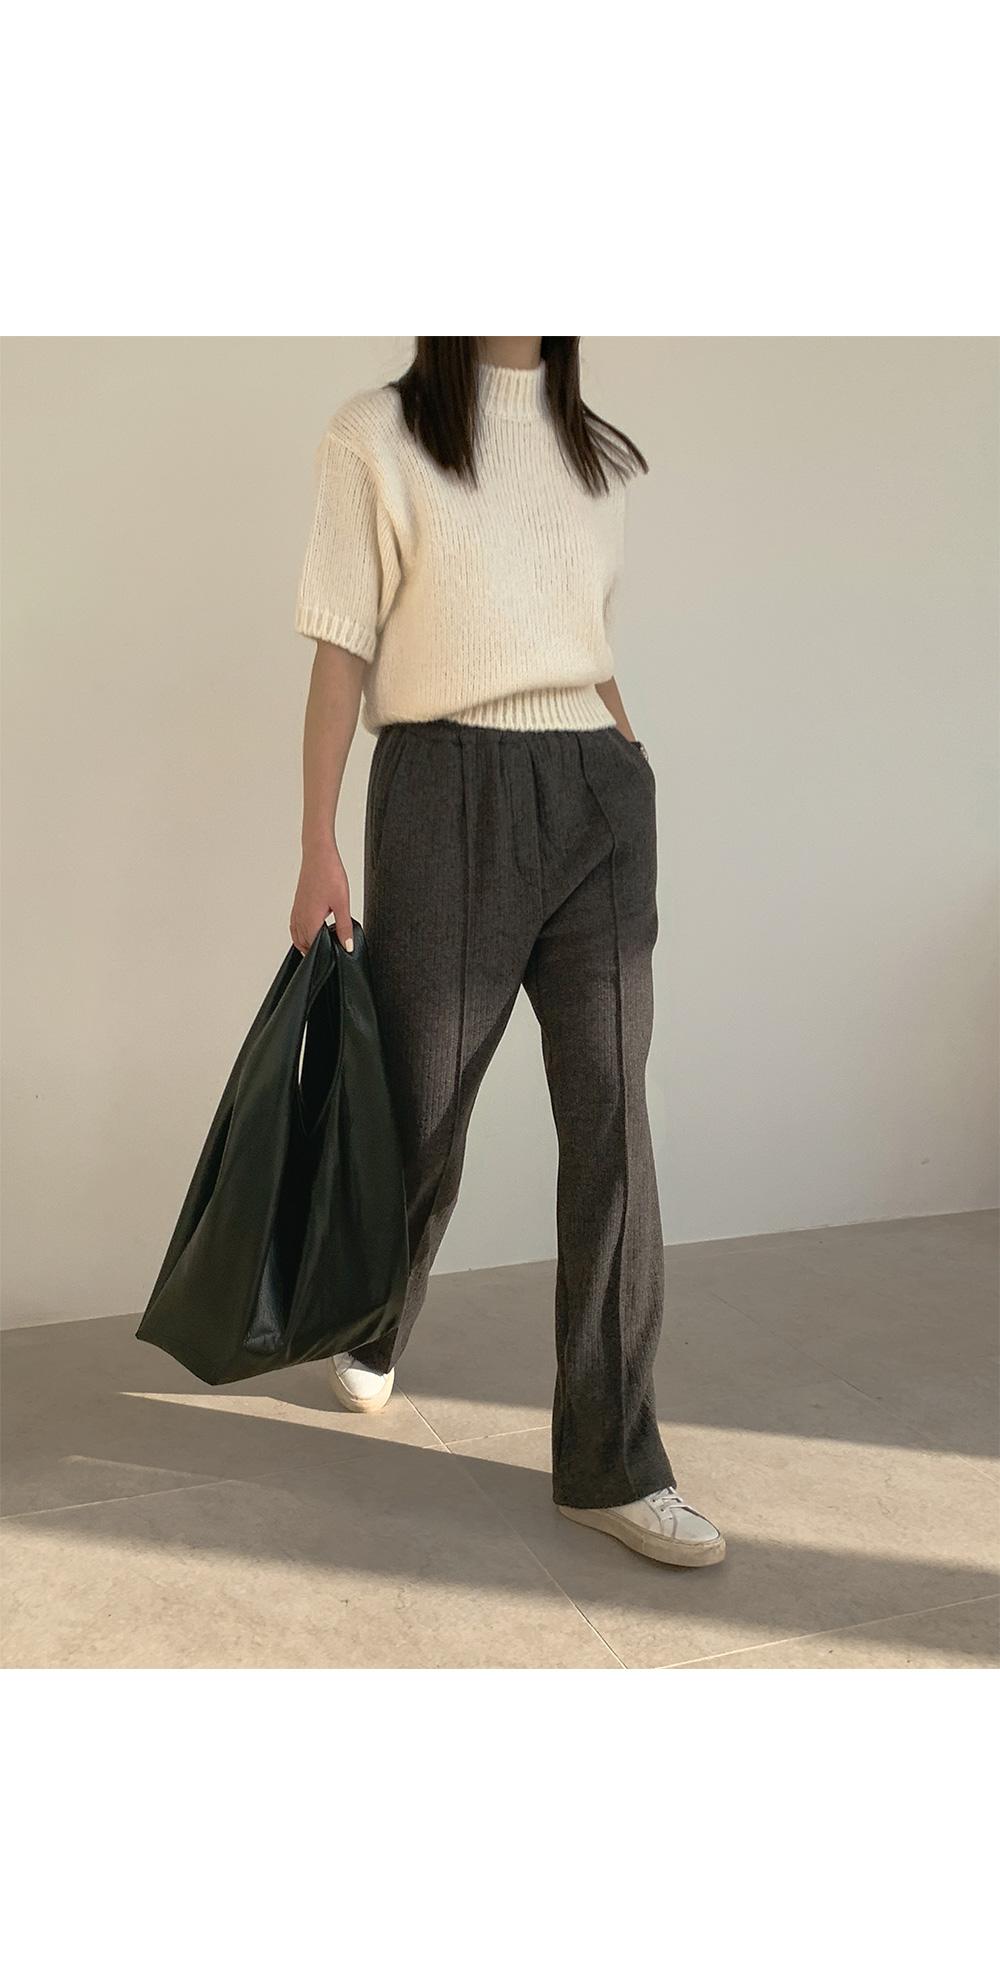 Renne half-neck short sleeve knit